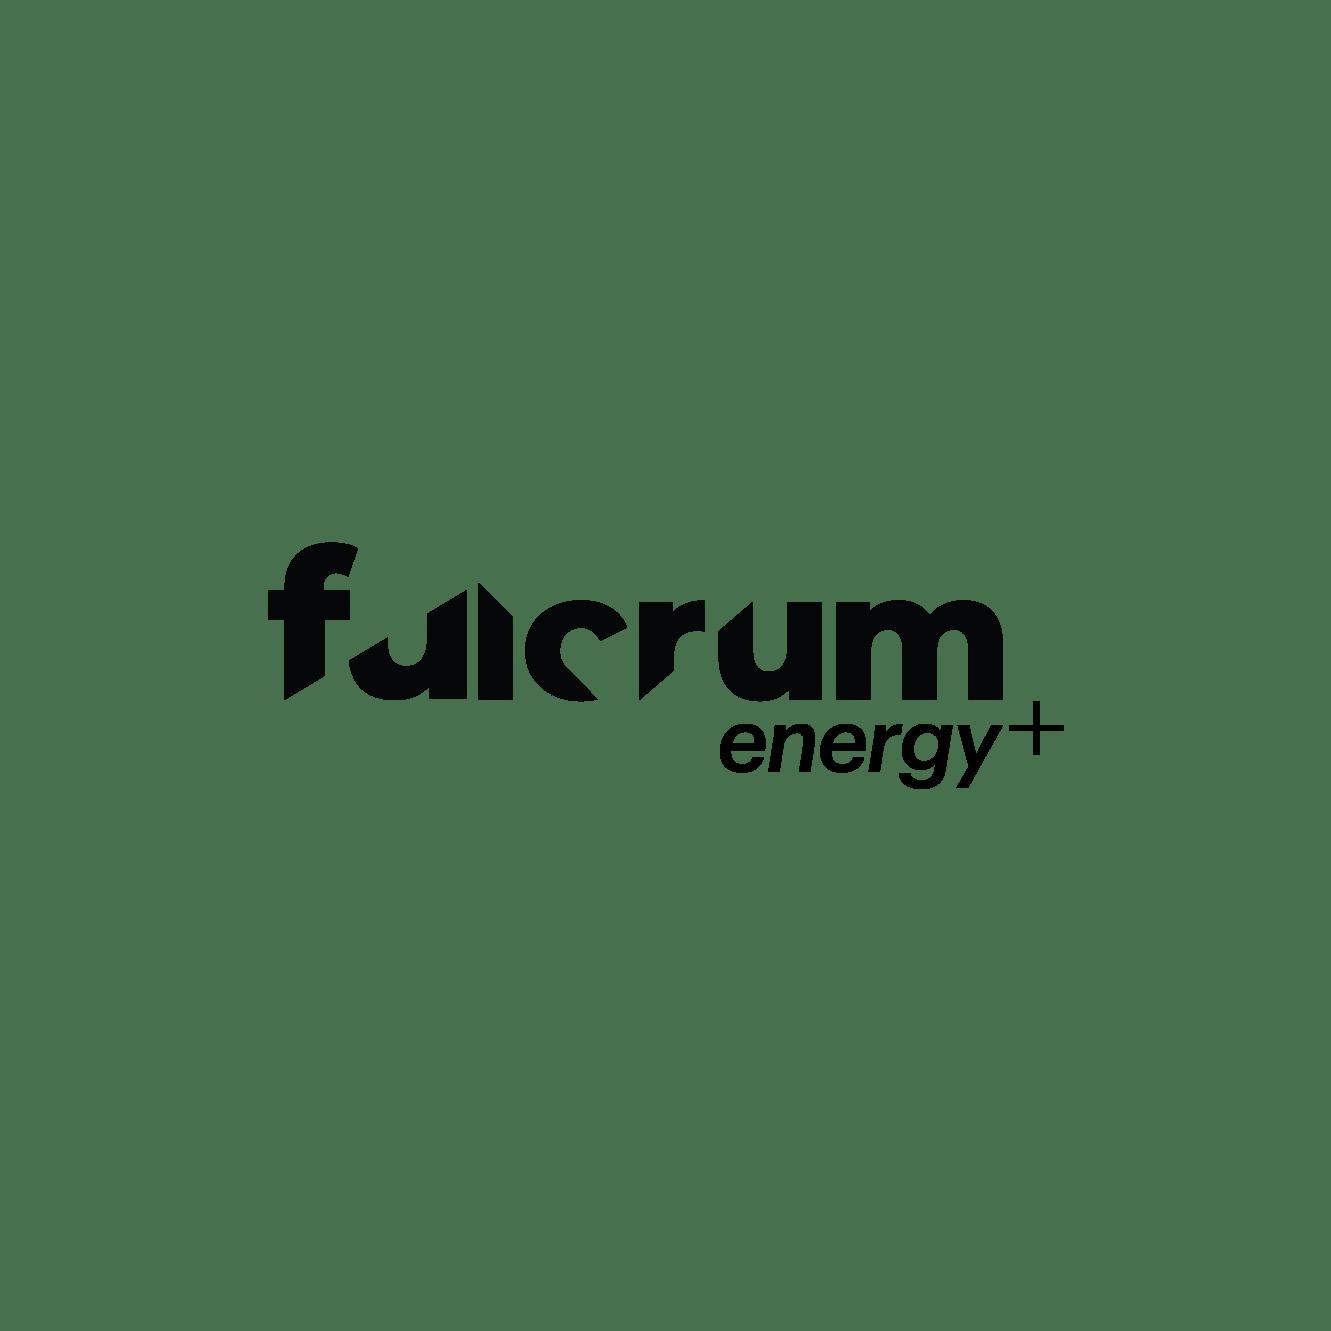 fulcrum_logosinitialselects_020419-06